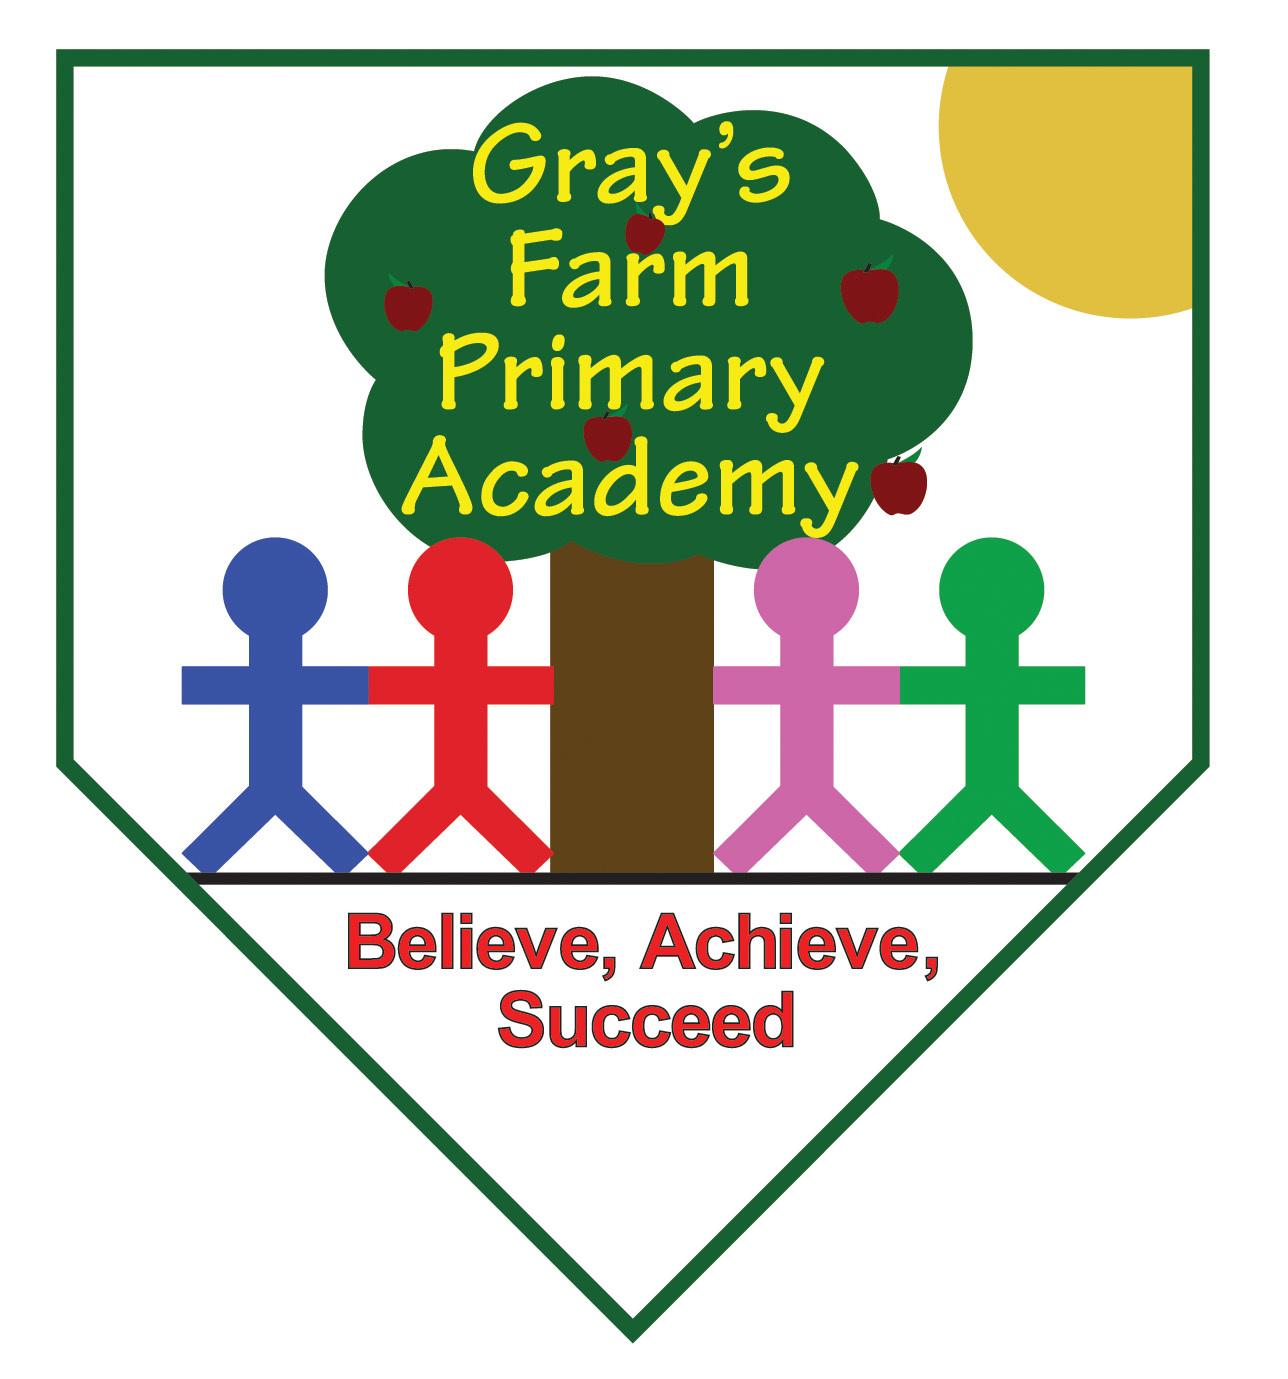 Gray's Farm Primary Academy